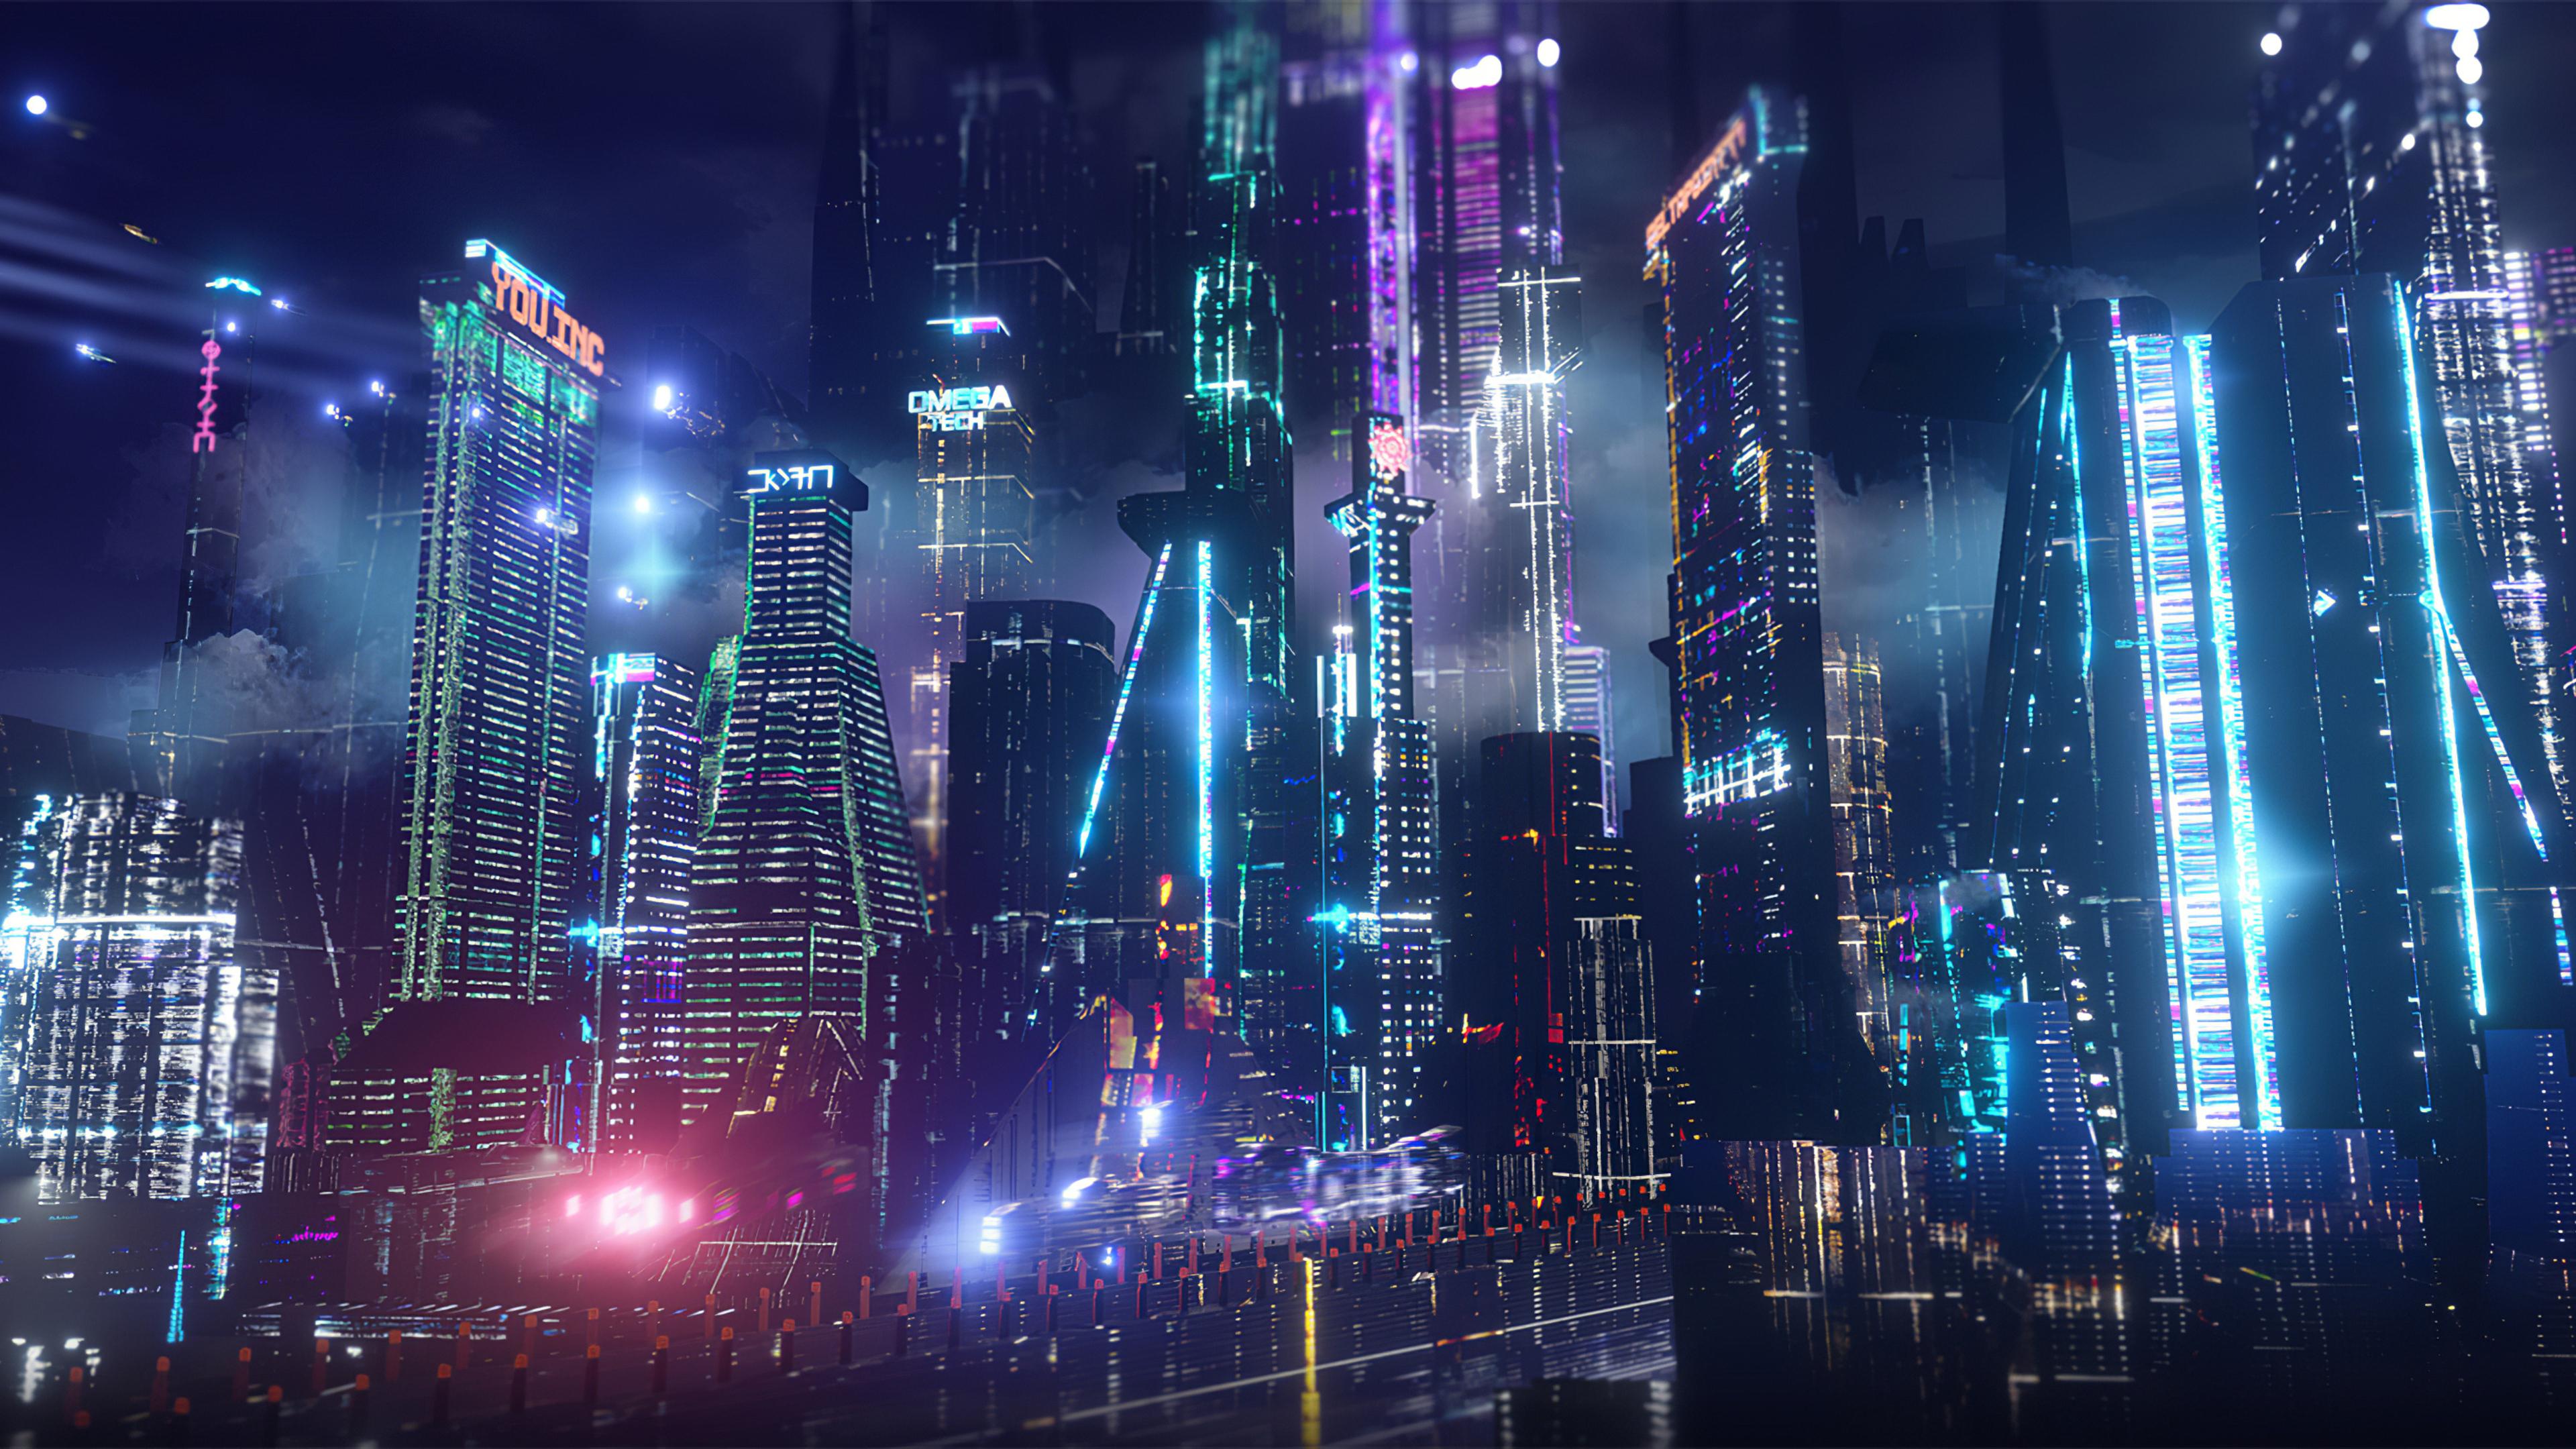 3840x2160 Neon City Lights 4k 4k HD 4k Wallpapers, Images ...